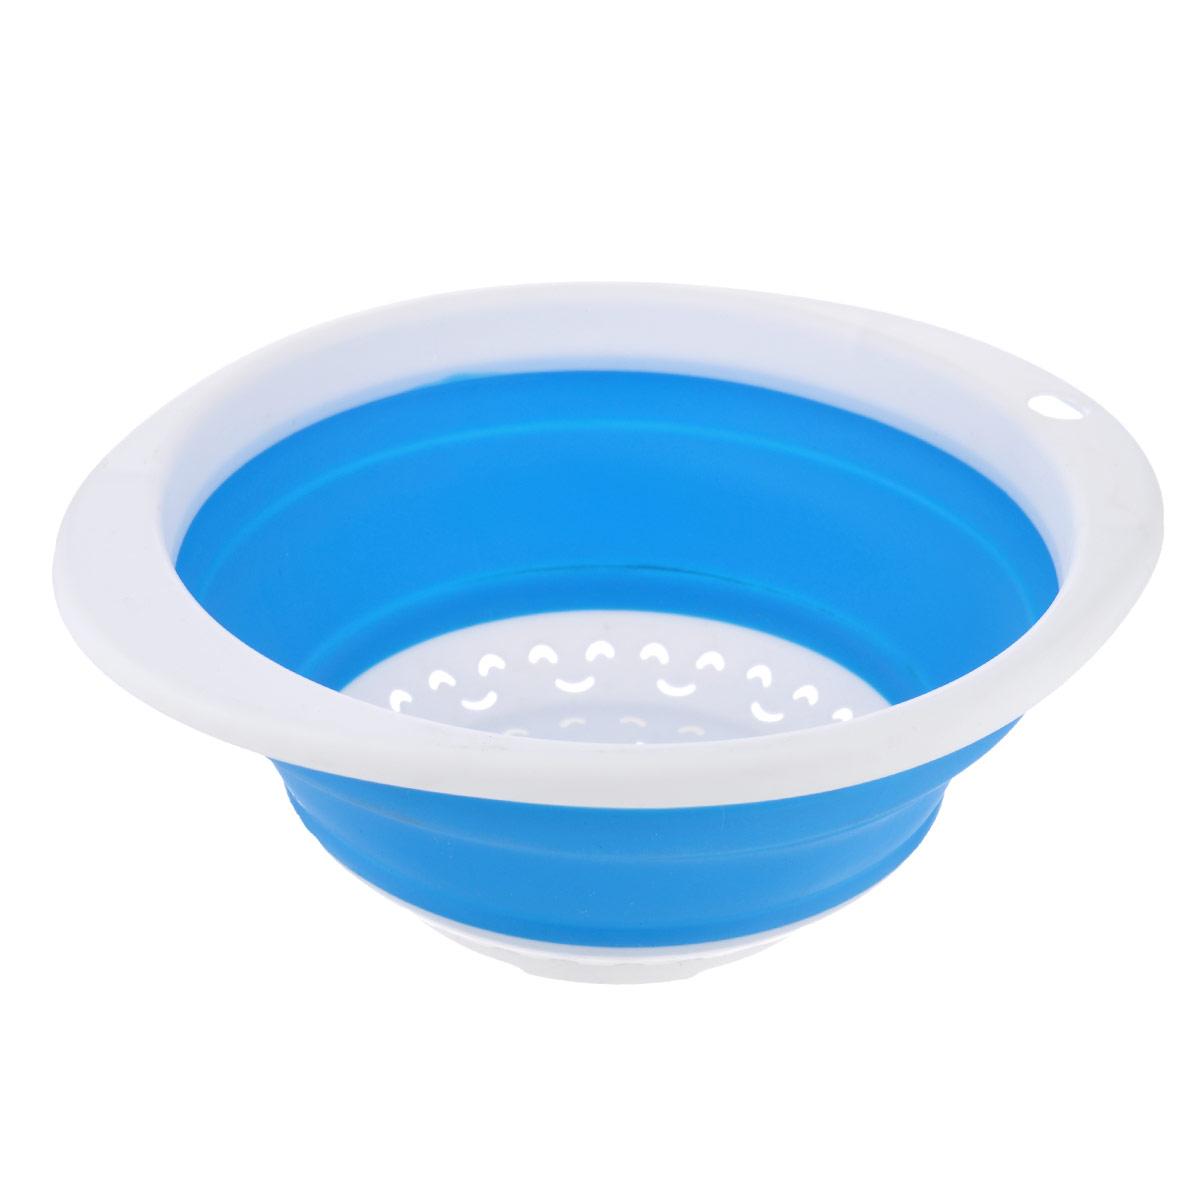 Дуршлаг складной Oriental Way, цвет: голубой, 23 х 21 см